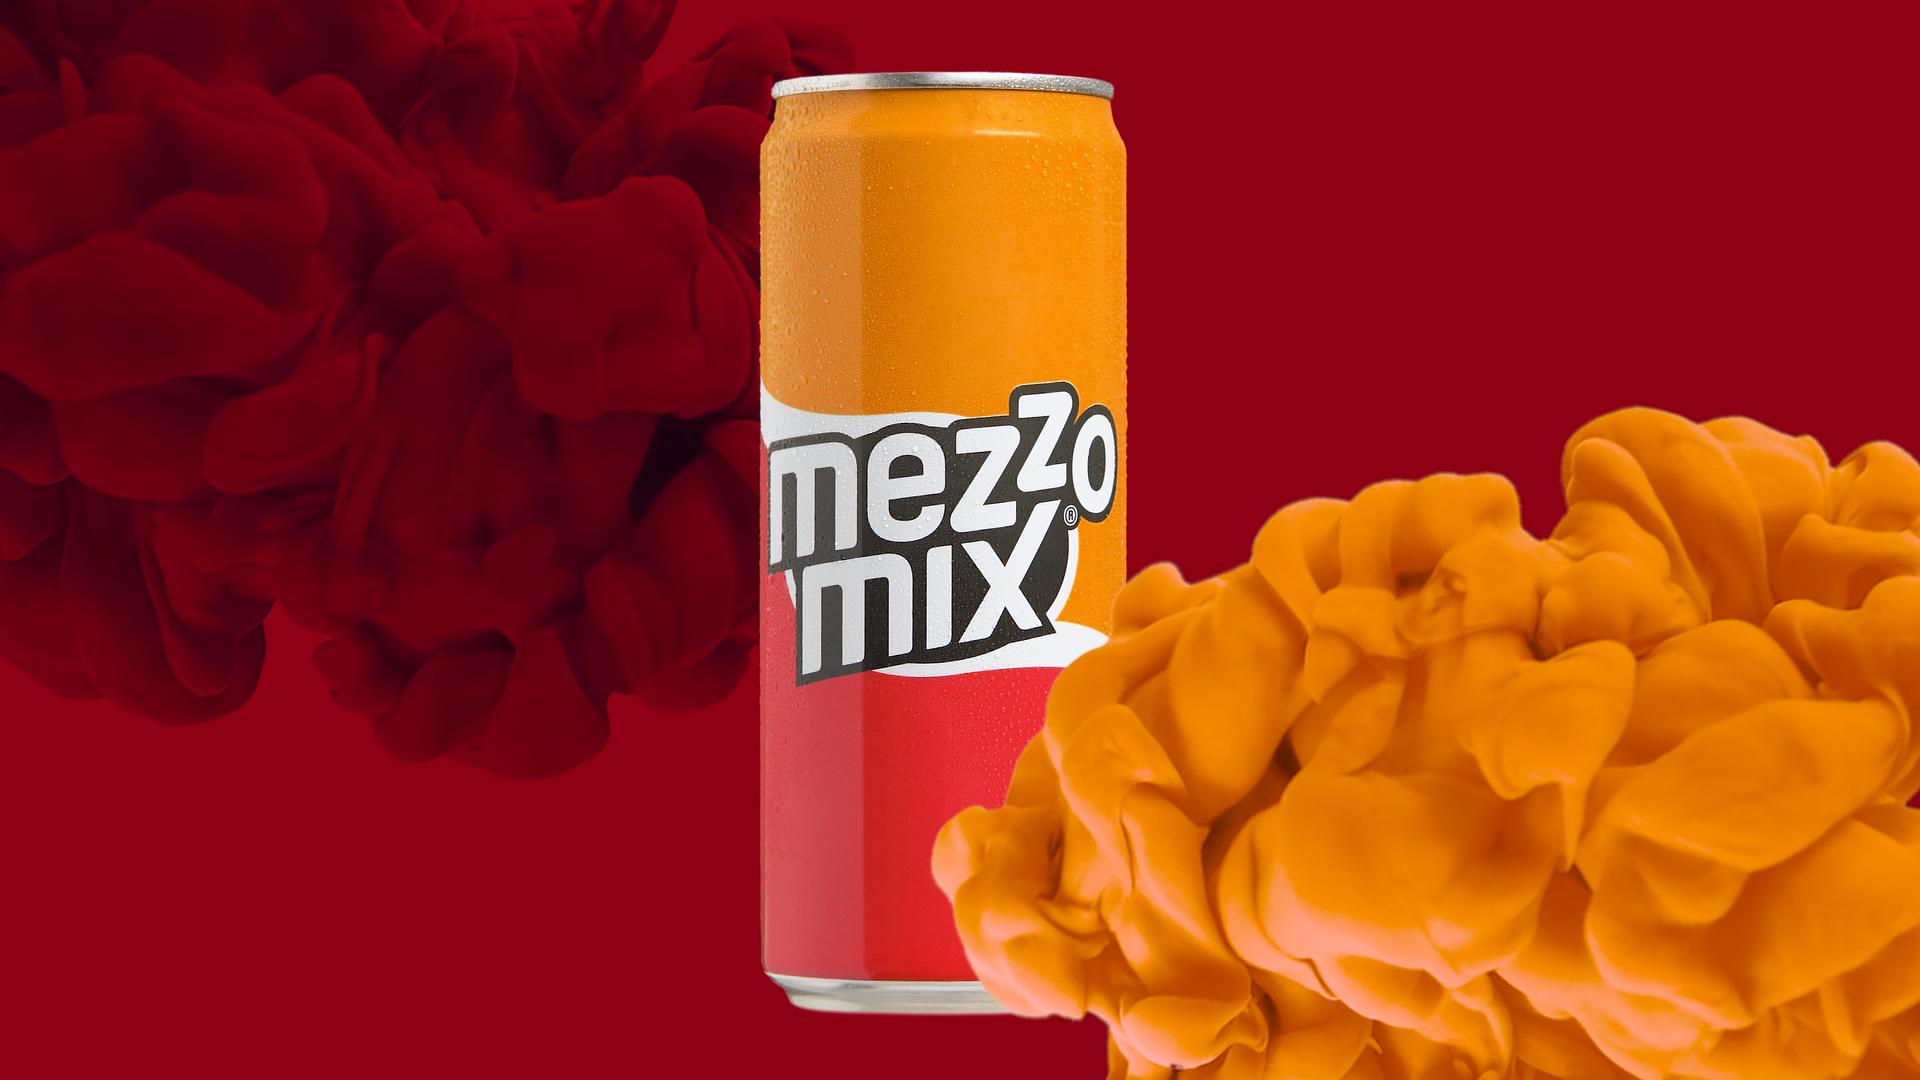 Mezzo Mix Werbung